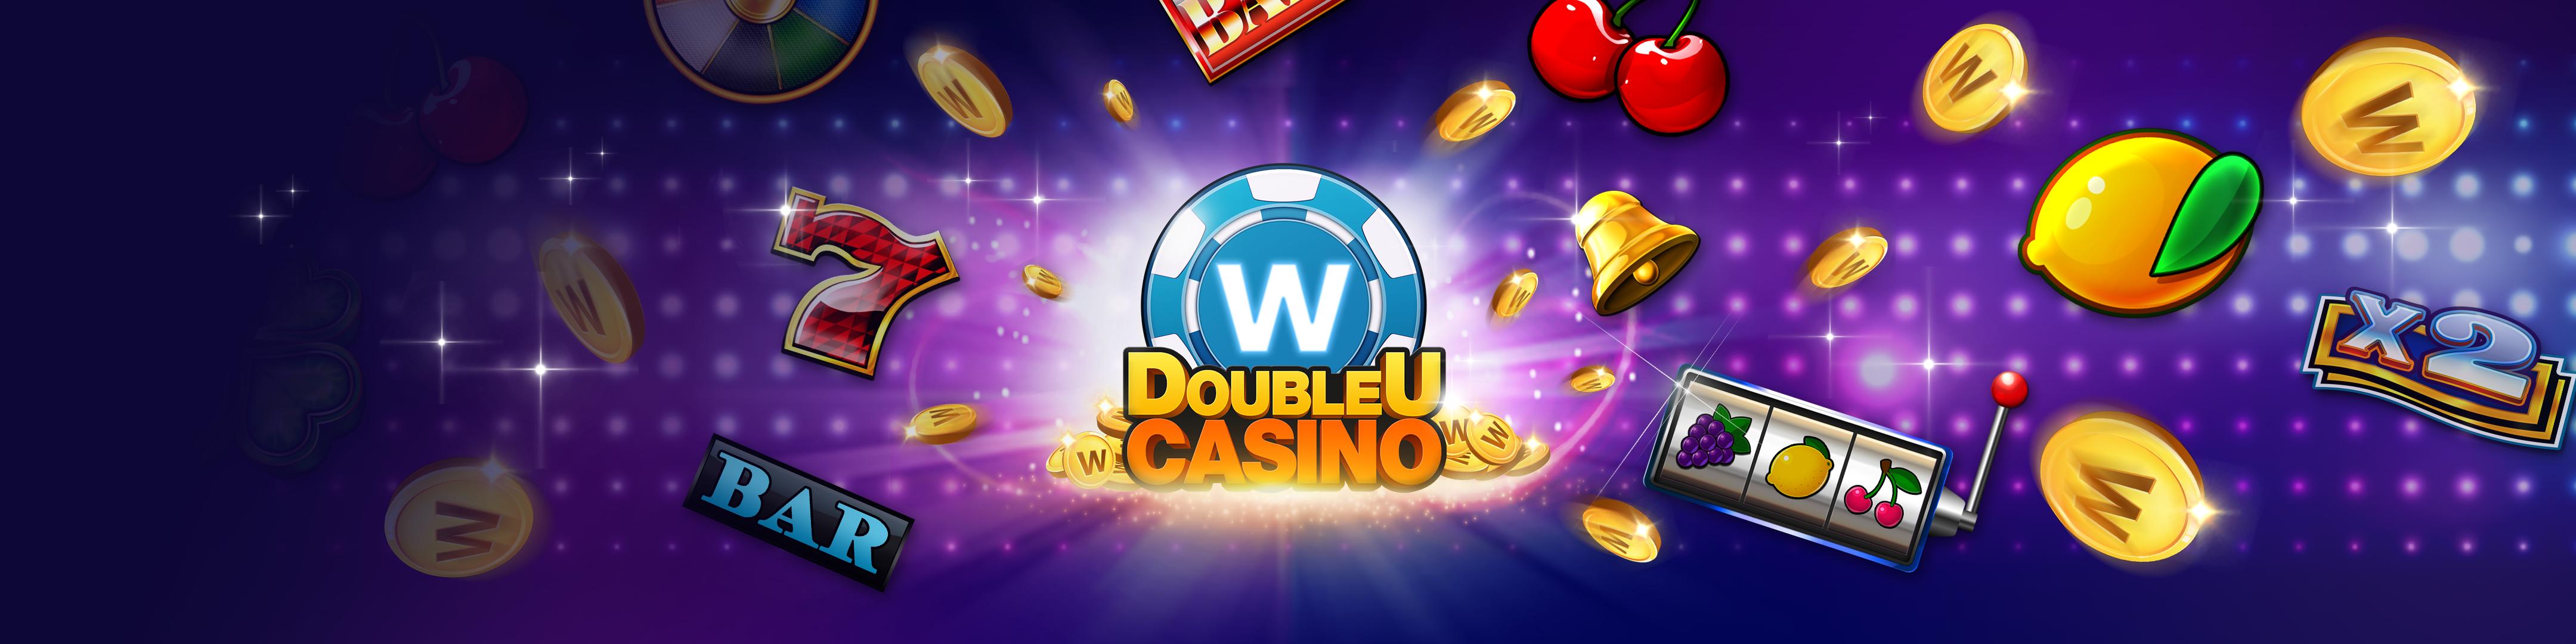 grand eagle casino bonus codes